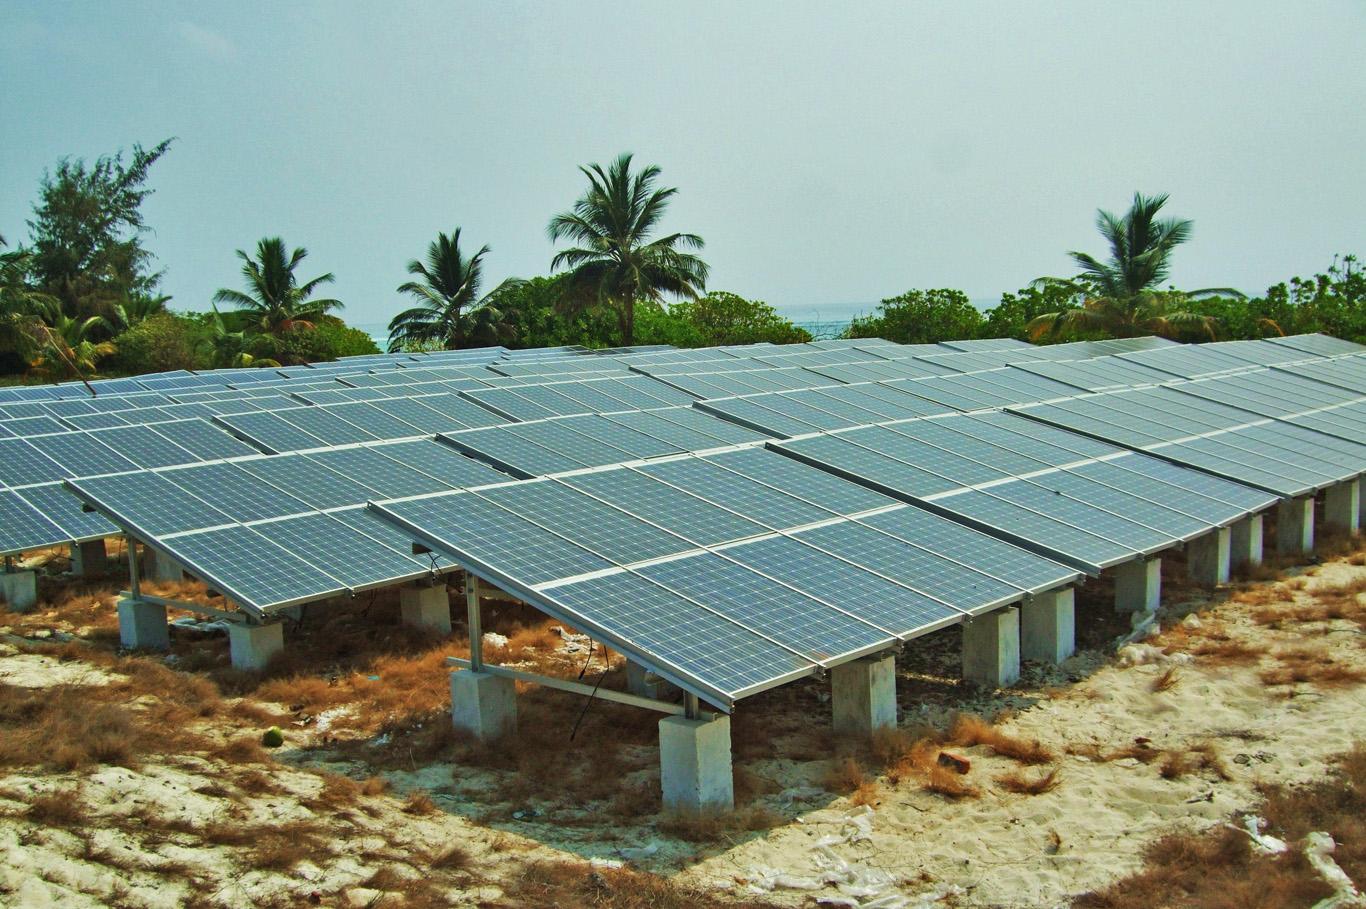 Solar power plant in Kadmat, Lakshadweep Islands